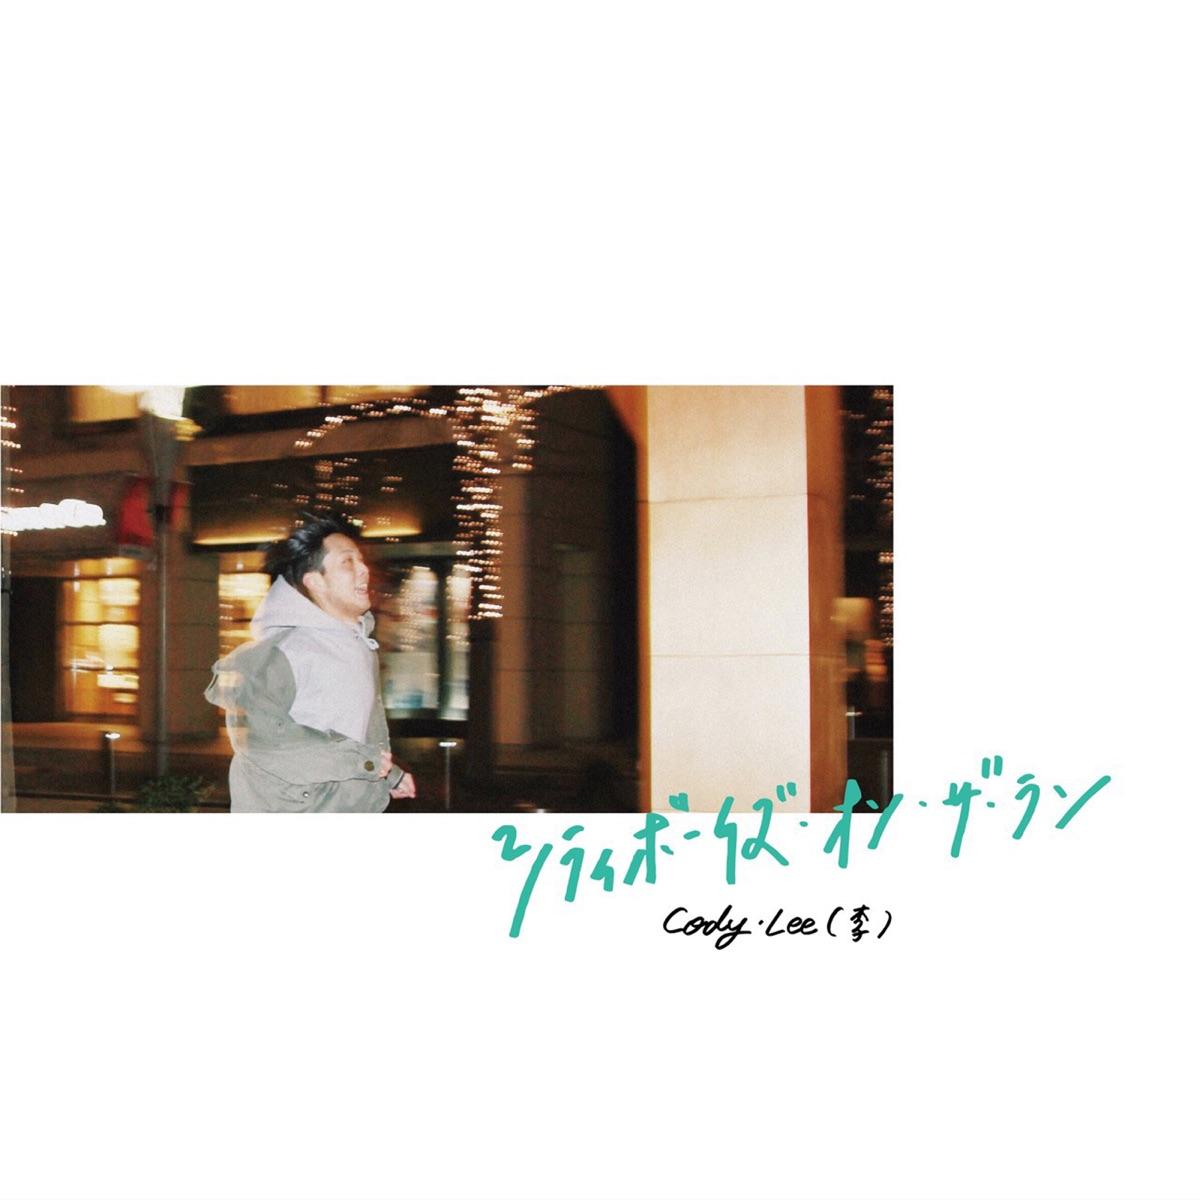 『Cody・Lee(李) - 春』収録の『シティボーイズ・オン・ザ・ラン』ジャケット